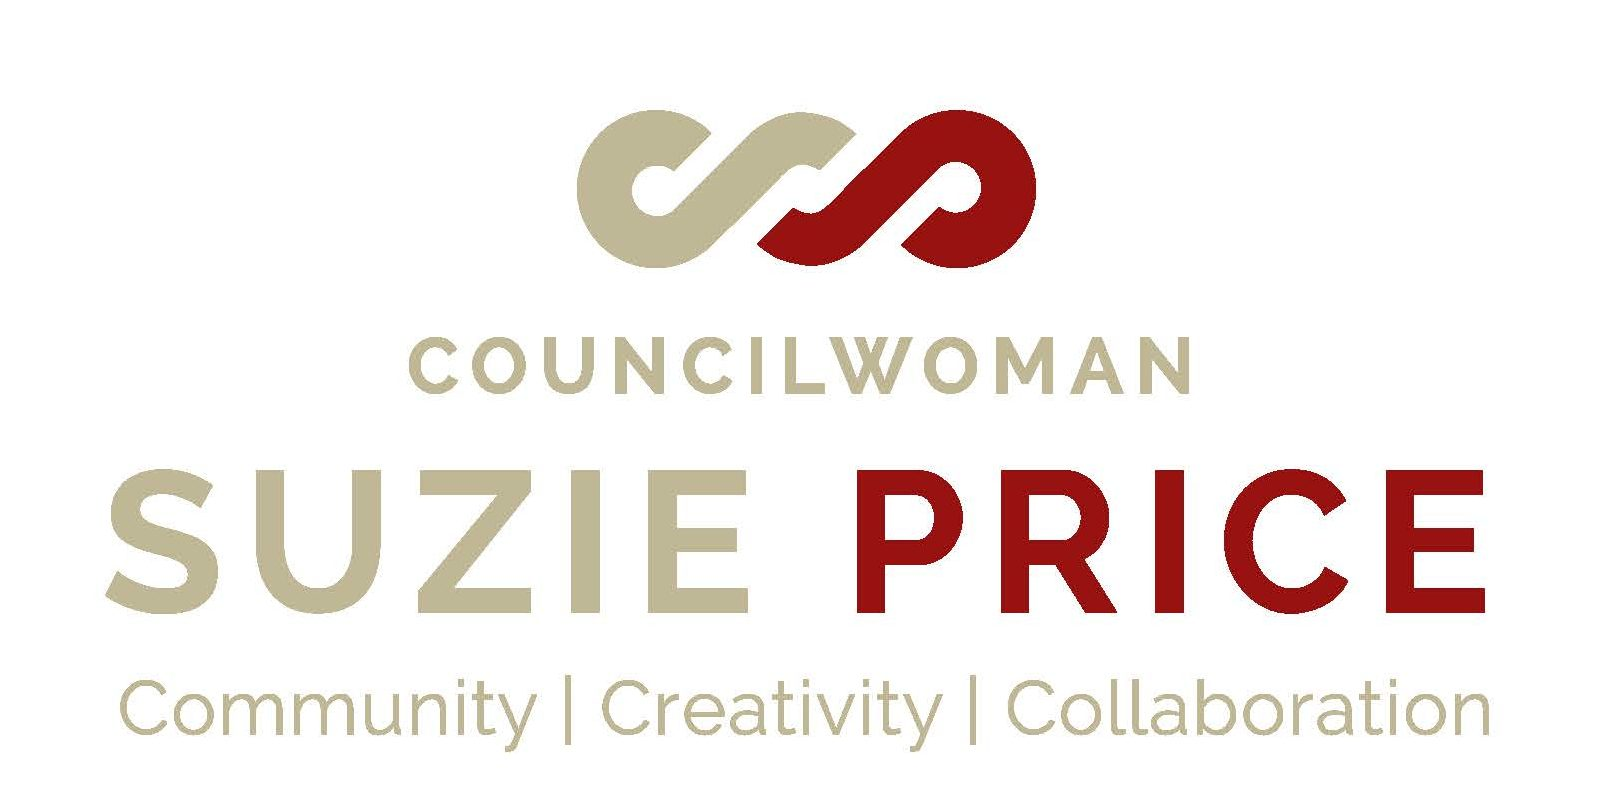 Councilwoman Suzie Price